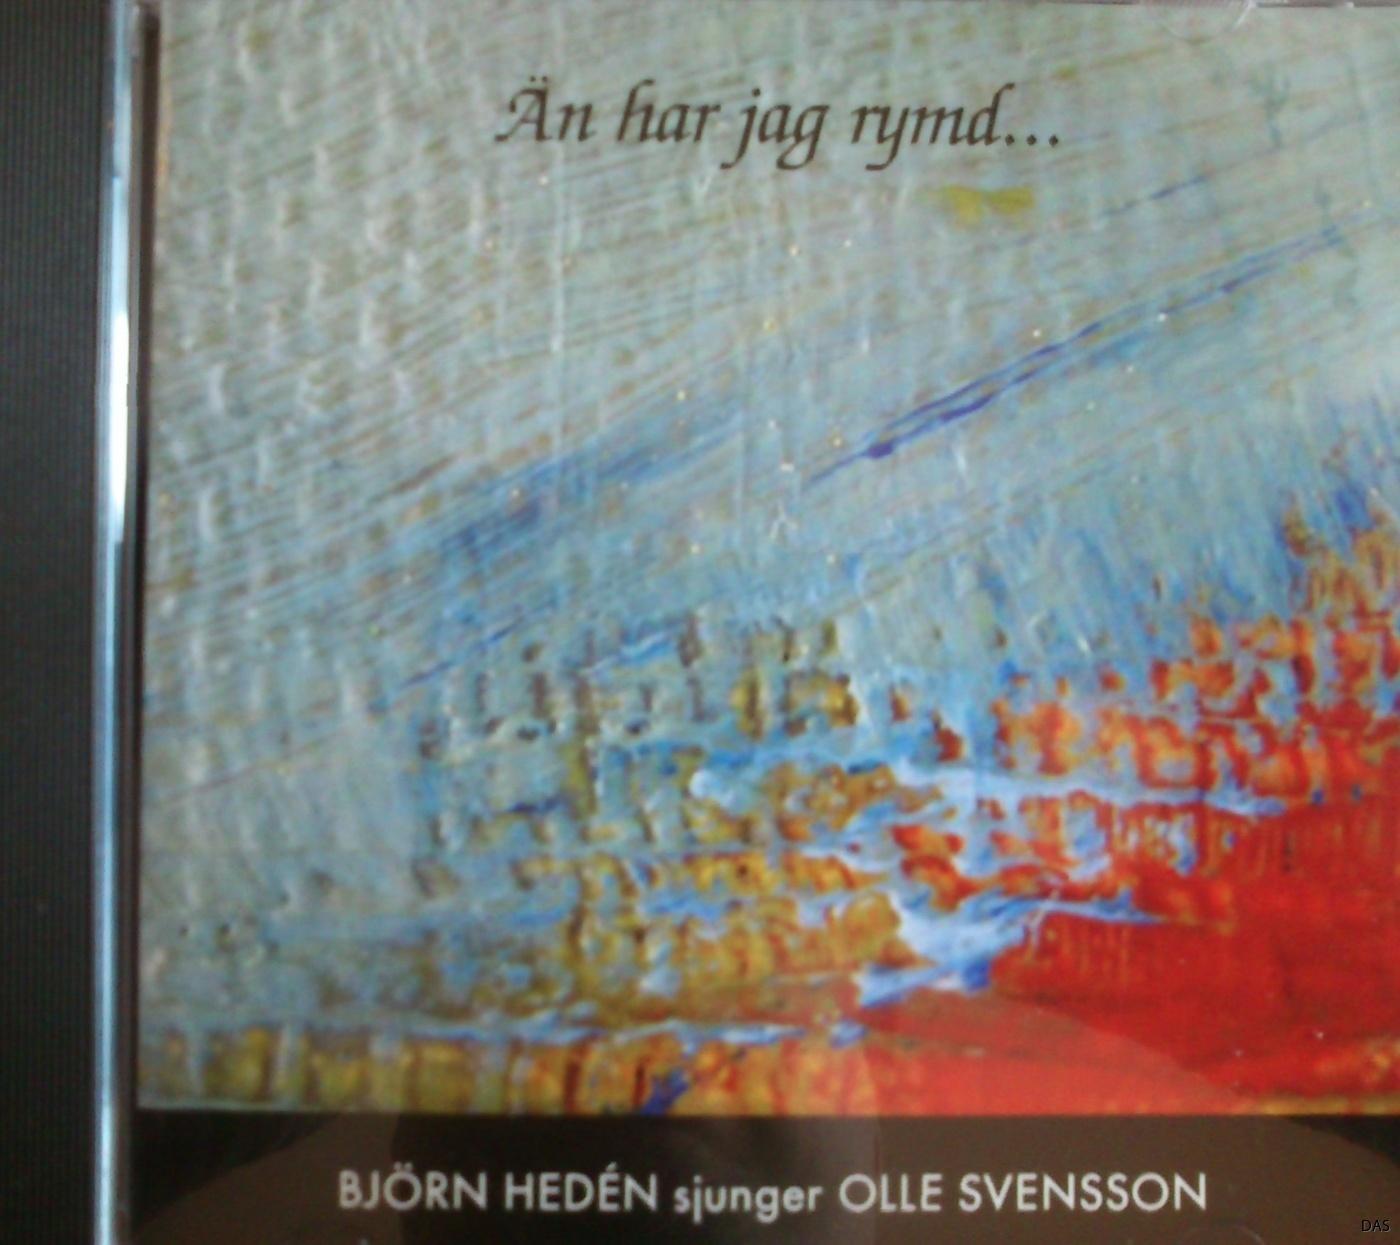 Björn Hedén: Än har jag rymd